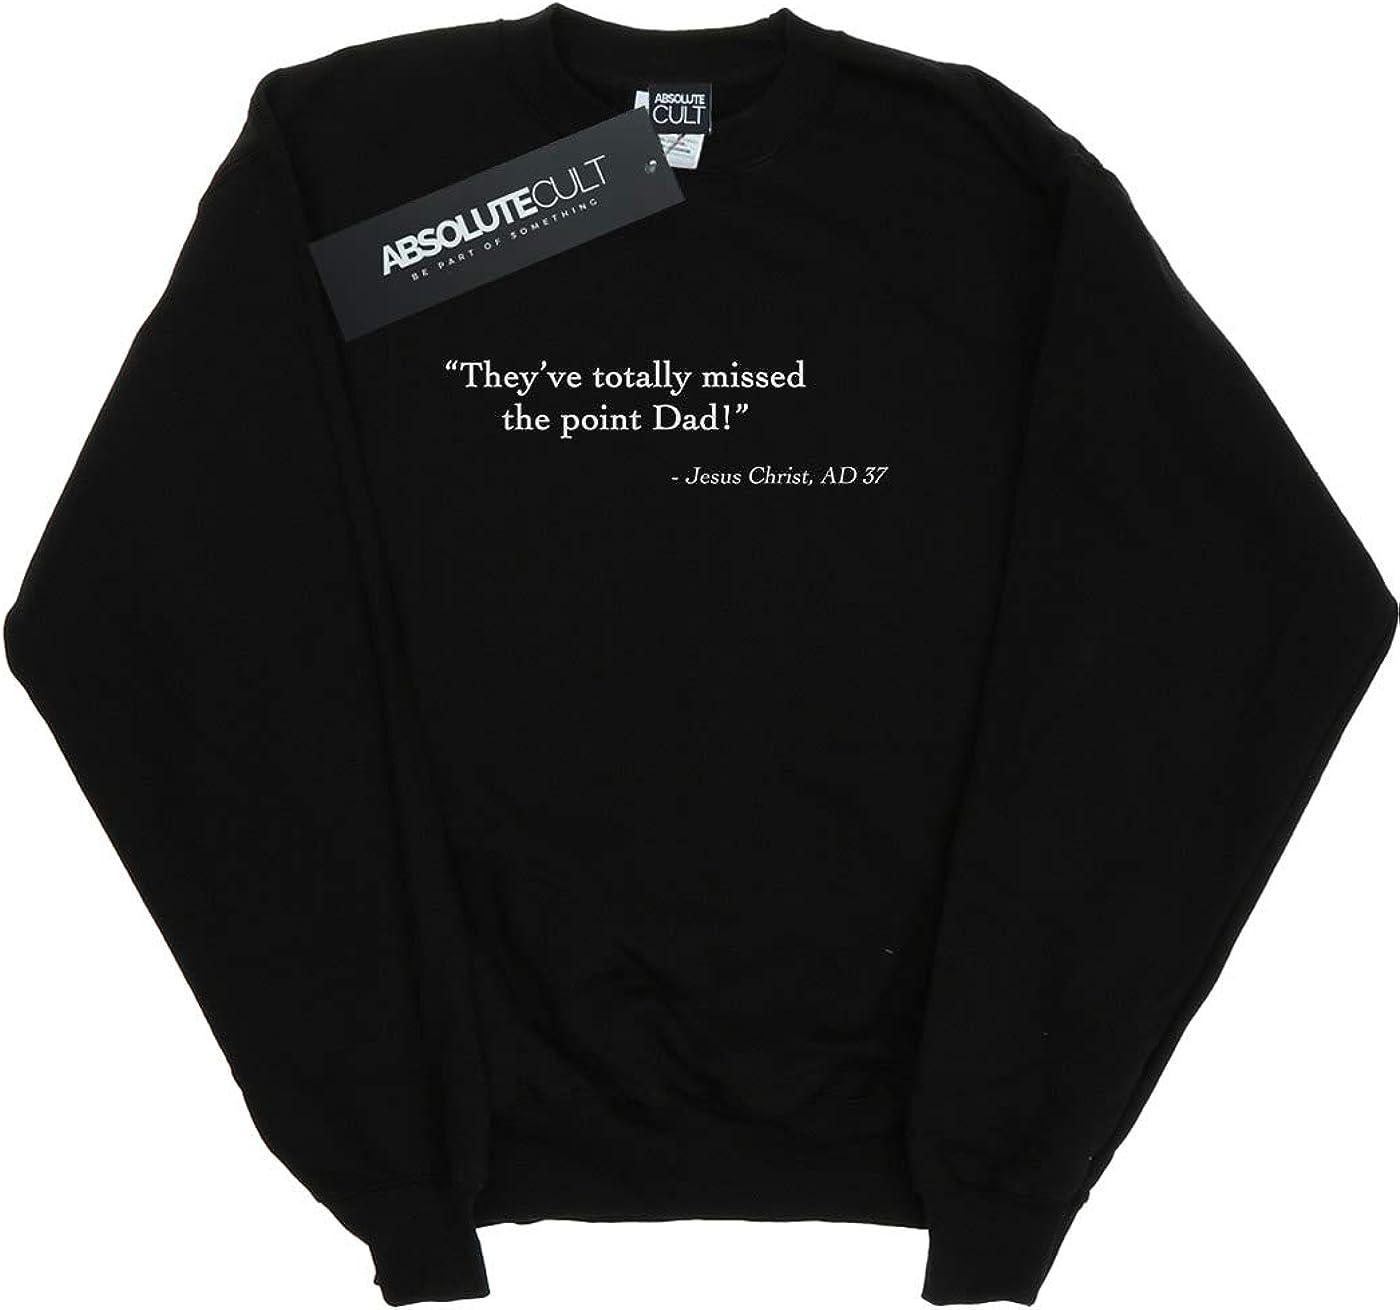 Absolute Cult Drewbacca Girls Jesus Christ Quote Sweatshirt